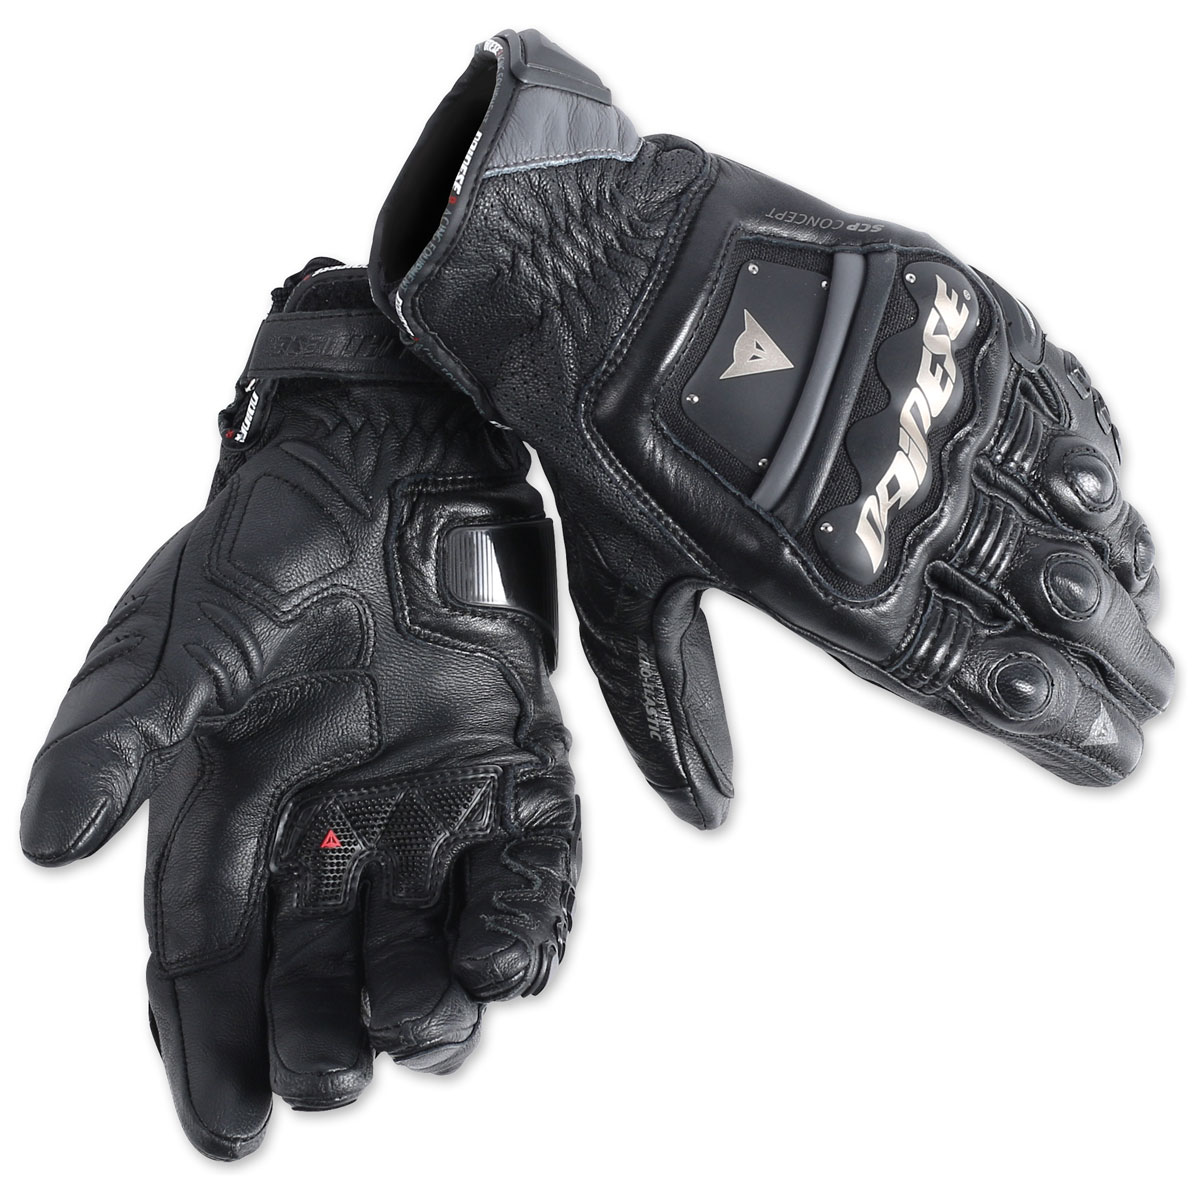 Dainese Men's 4 Stroke Evo Black Gloves